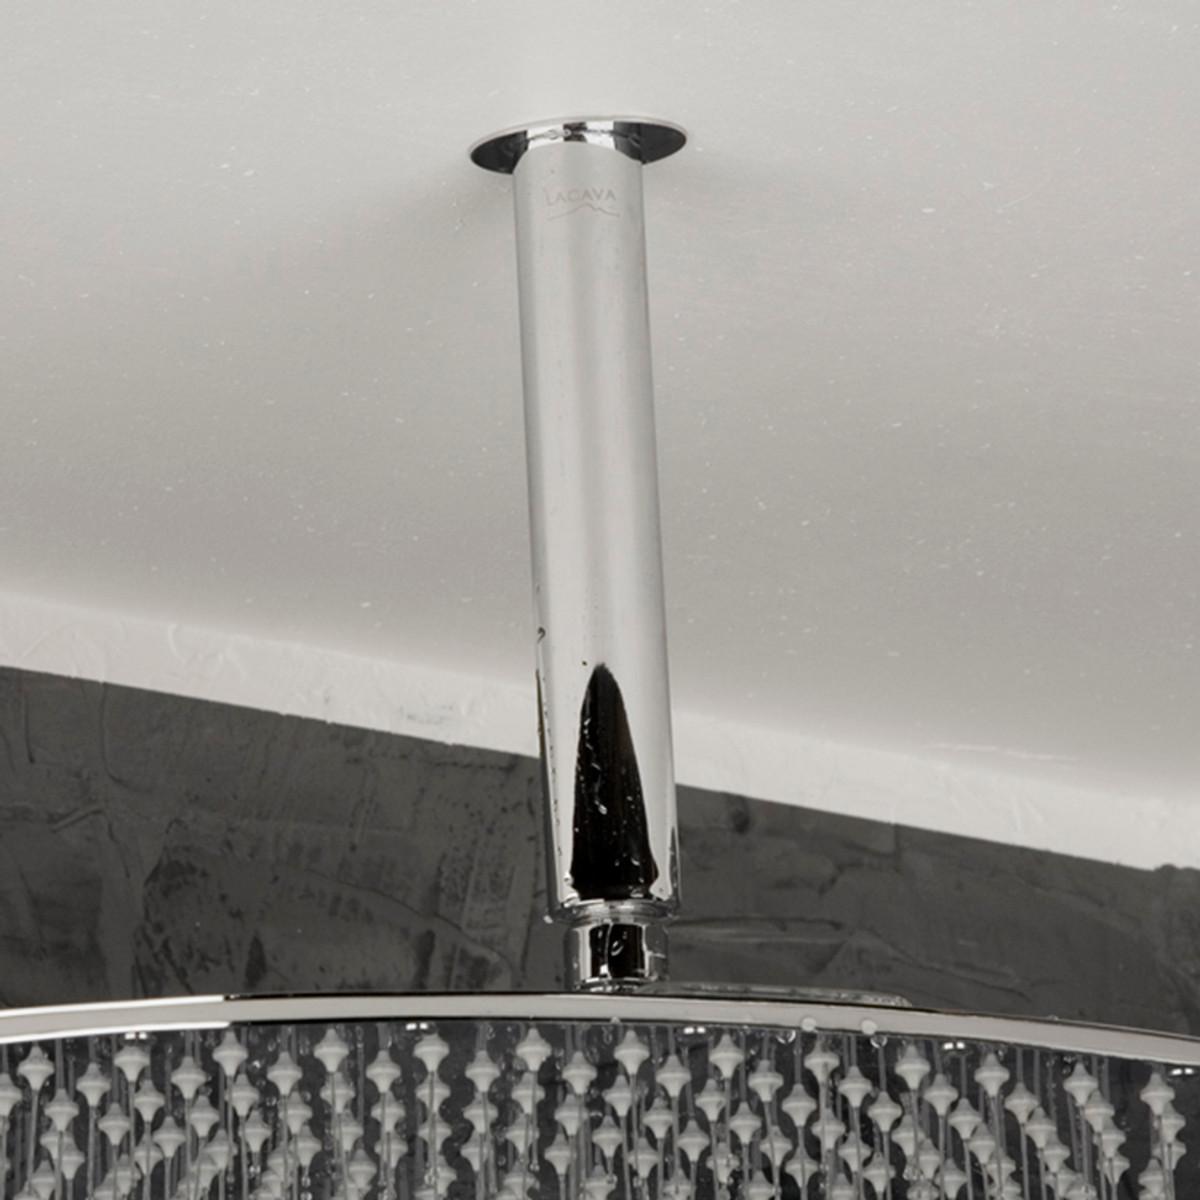 0669 Perla Shower Arm